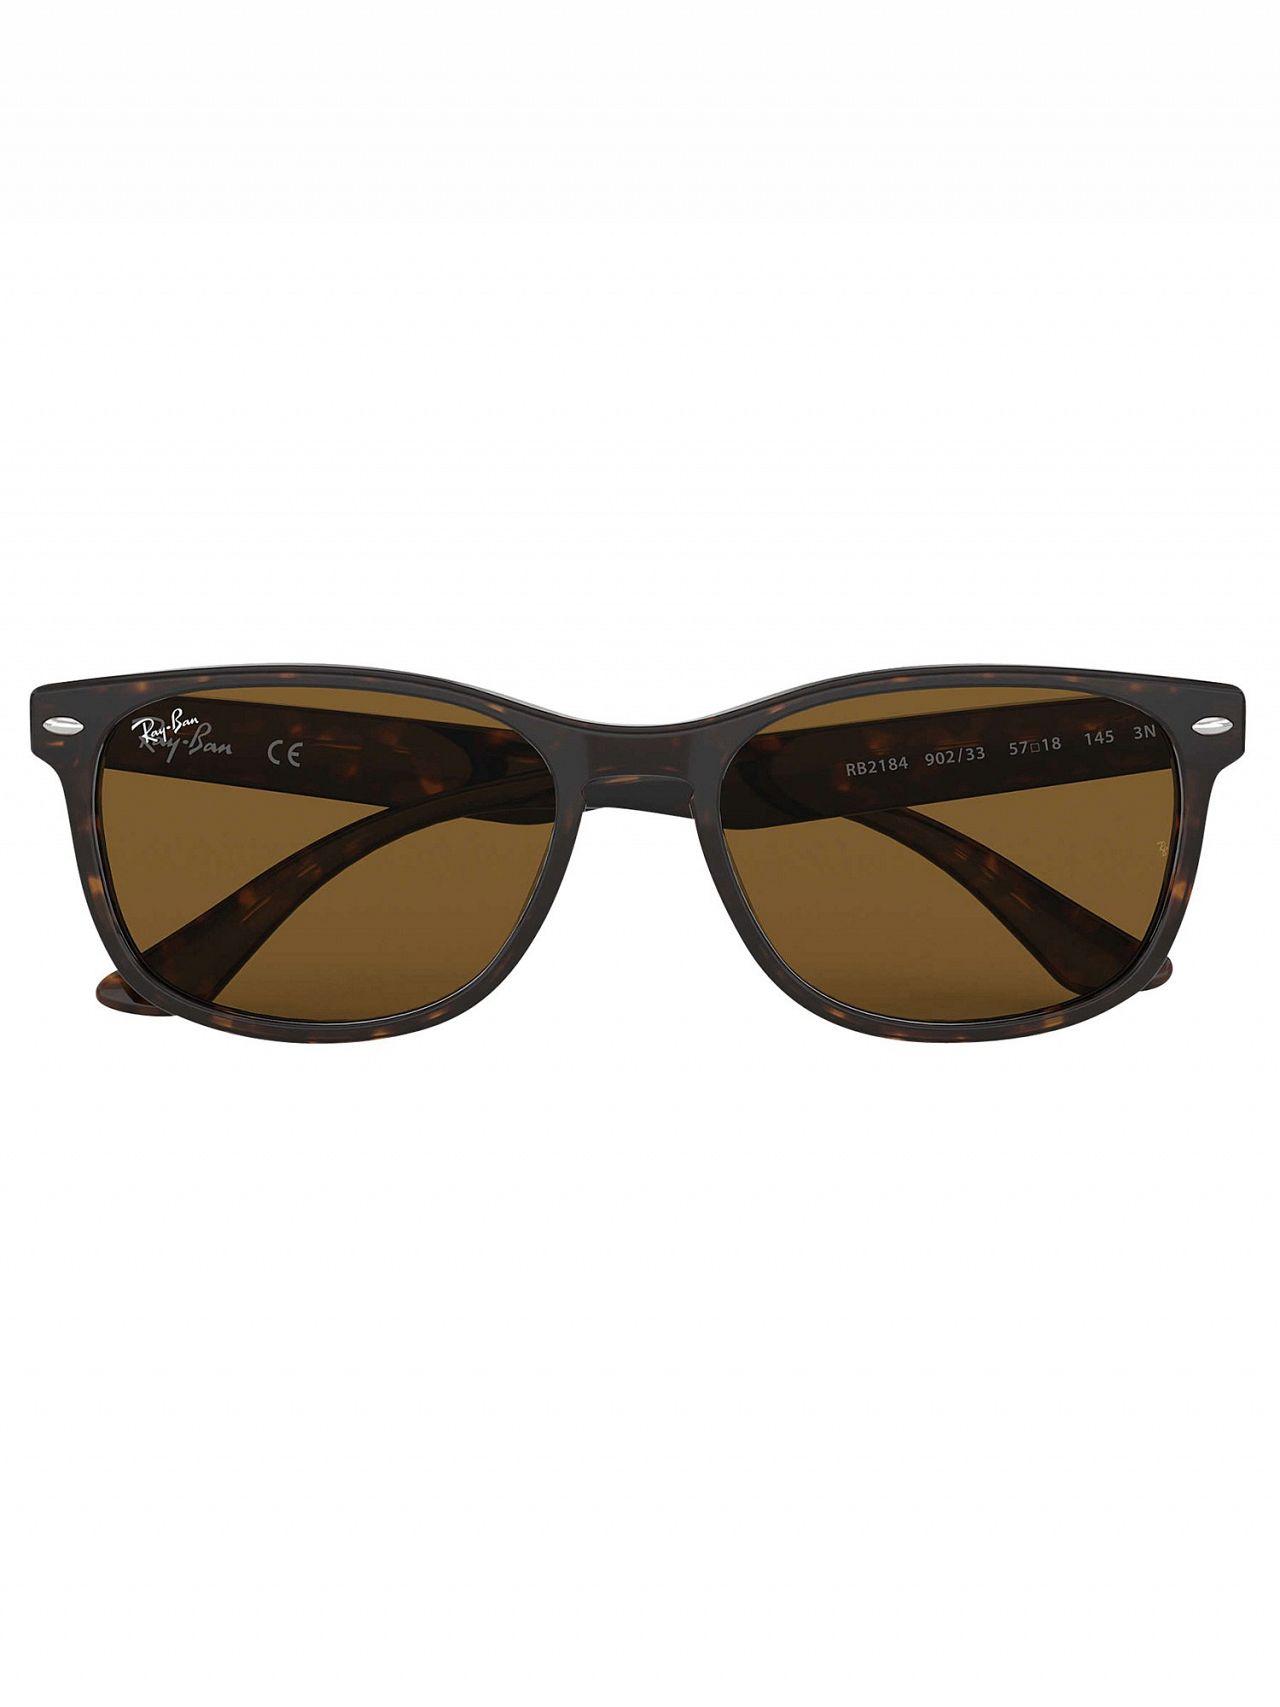 3fe295735b Ray-Ban Tortoise RB2184 Acetate Sunglasses